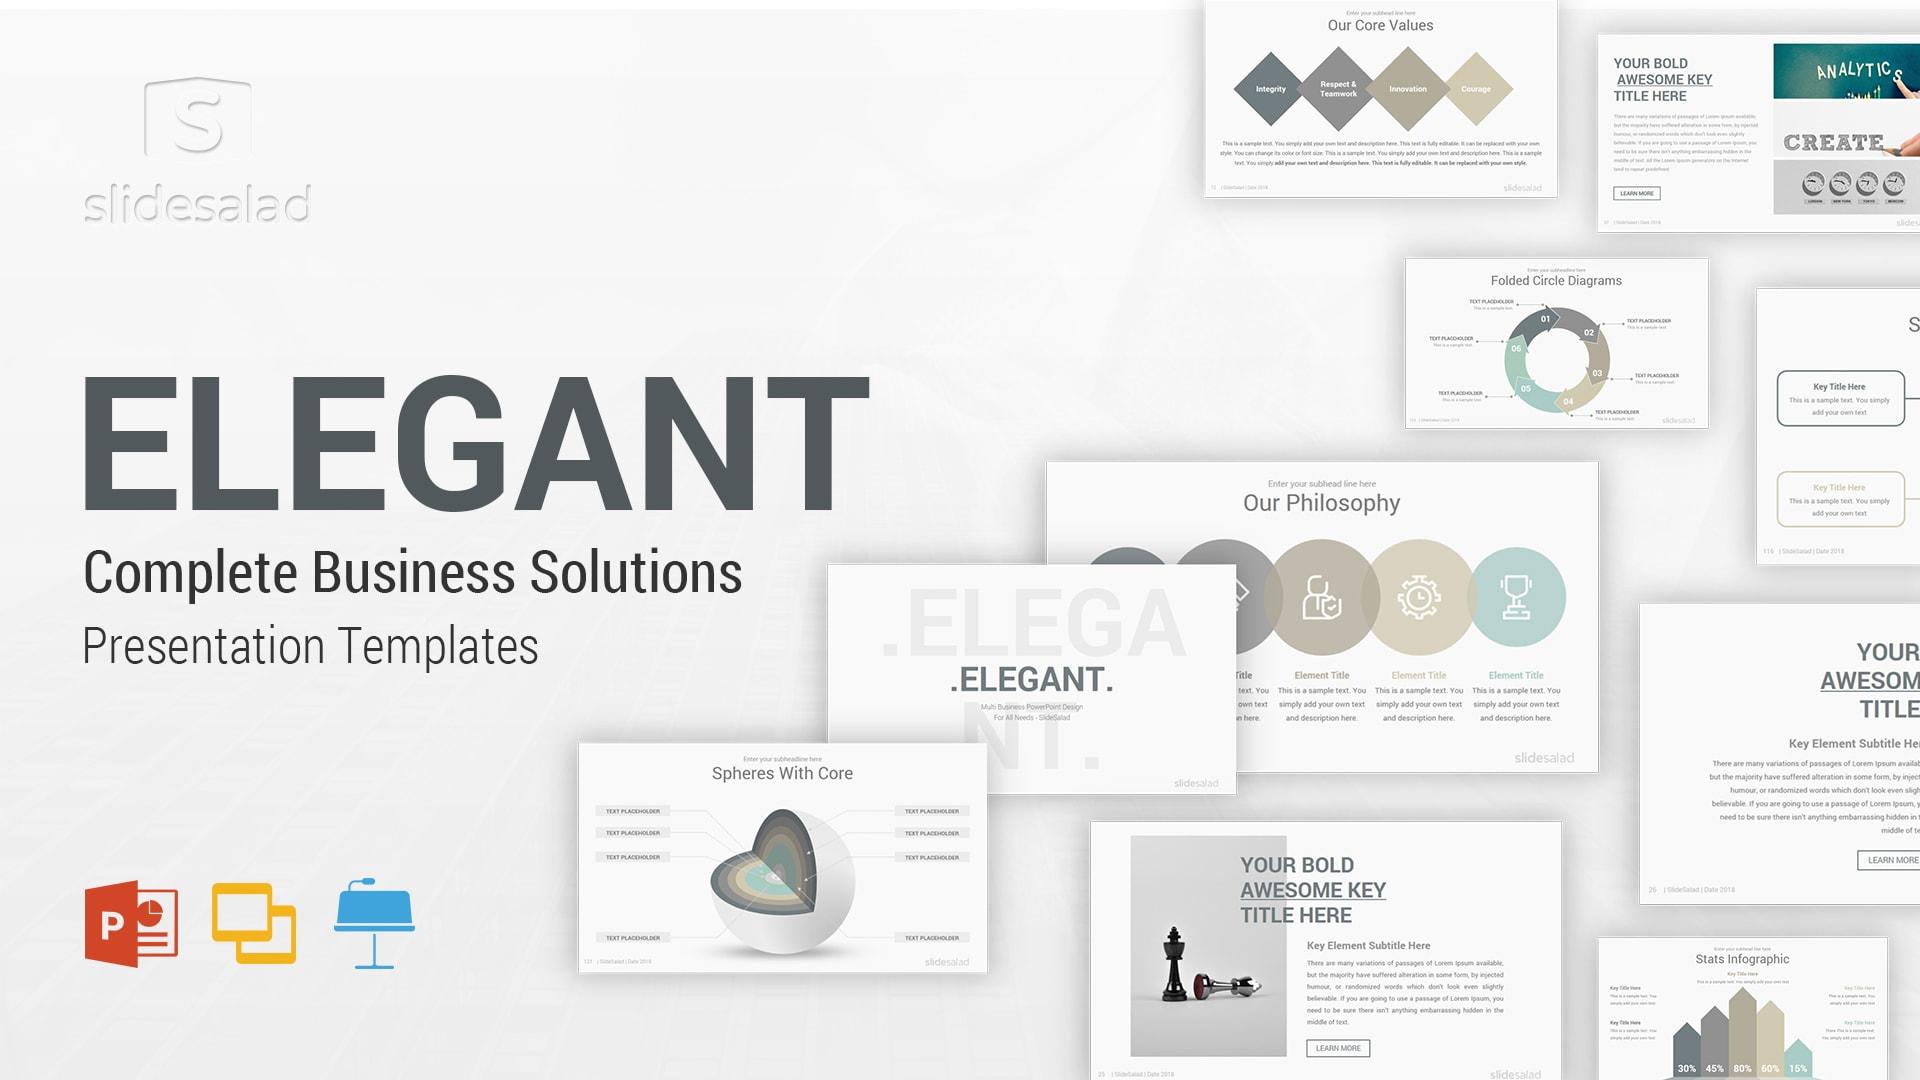 Elegant PowerPoint Pitch Template Deck – Elegant PowerPoint Presentation Templates Designs